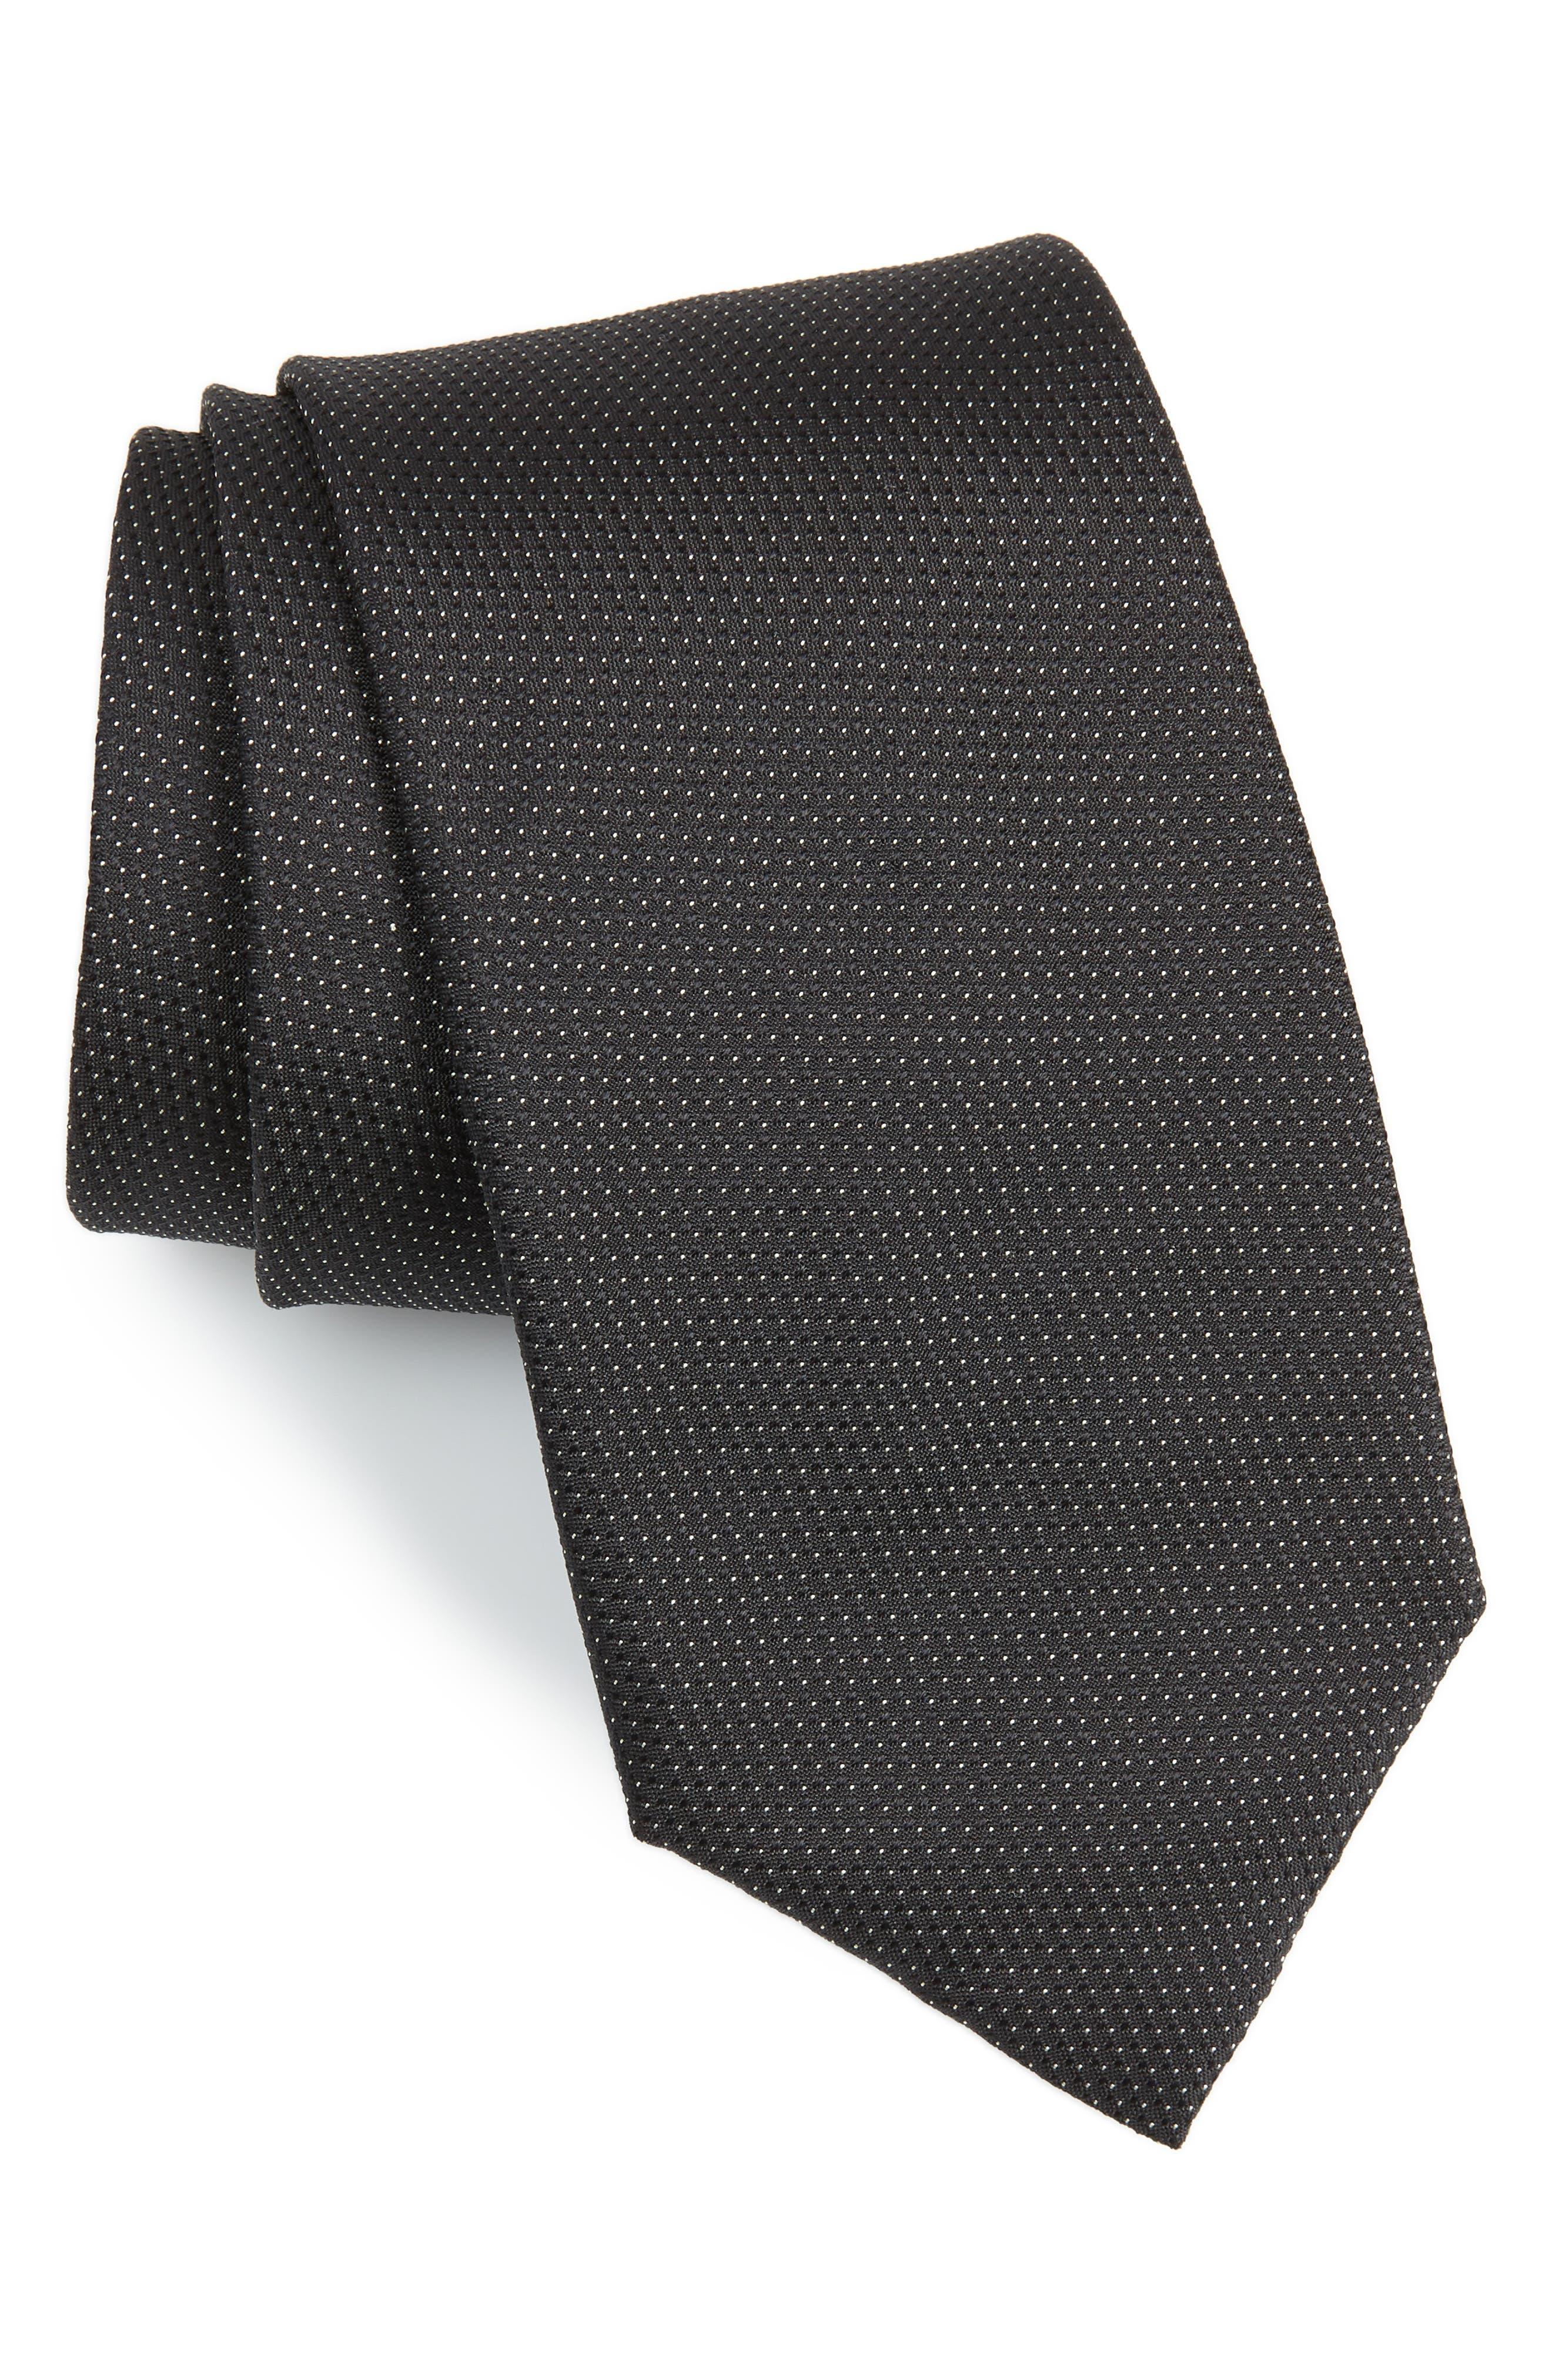 Dot Silk Tie,                         Main,                         color, Black